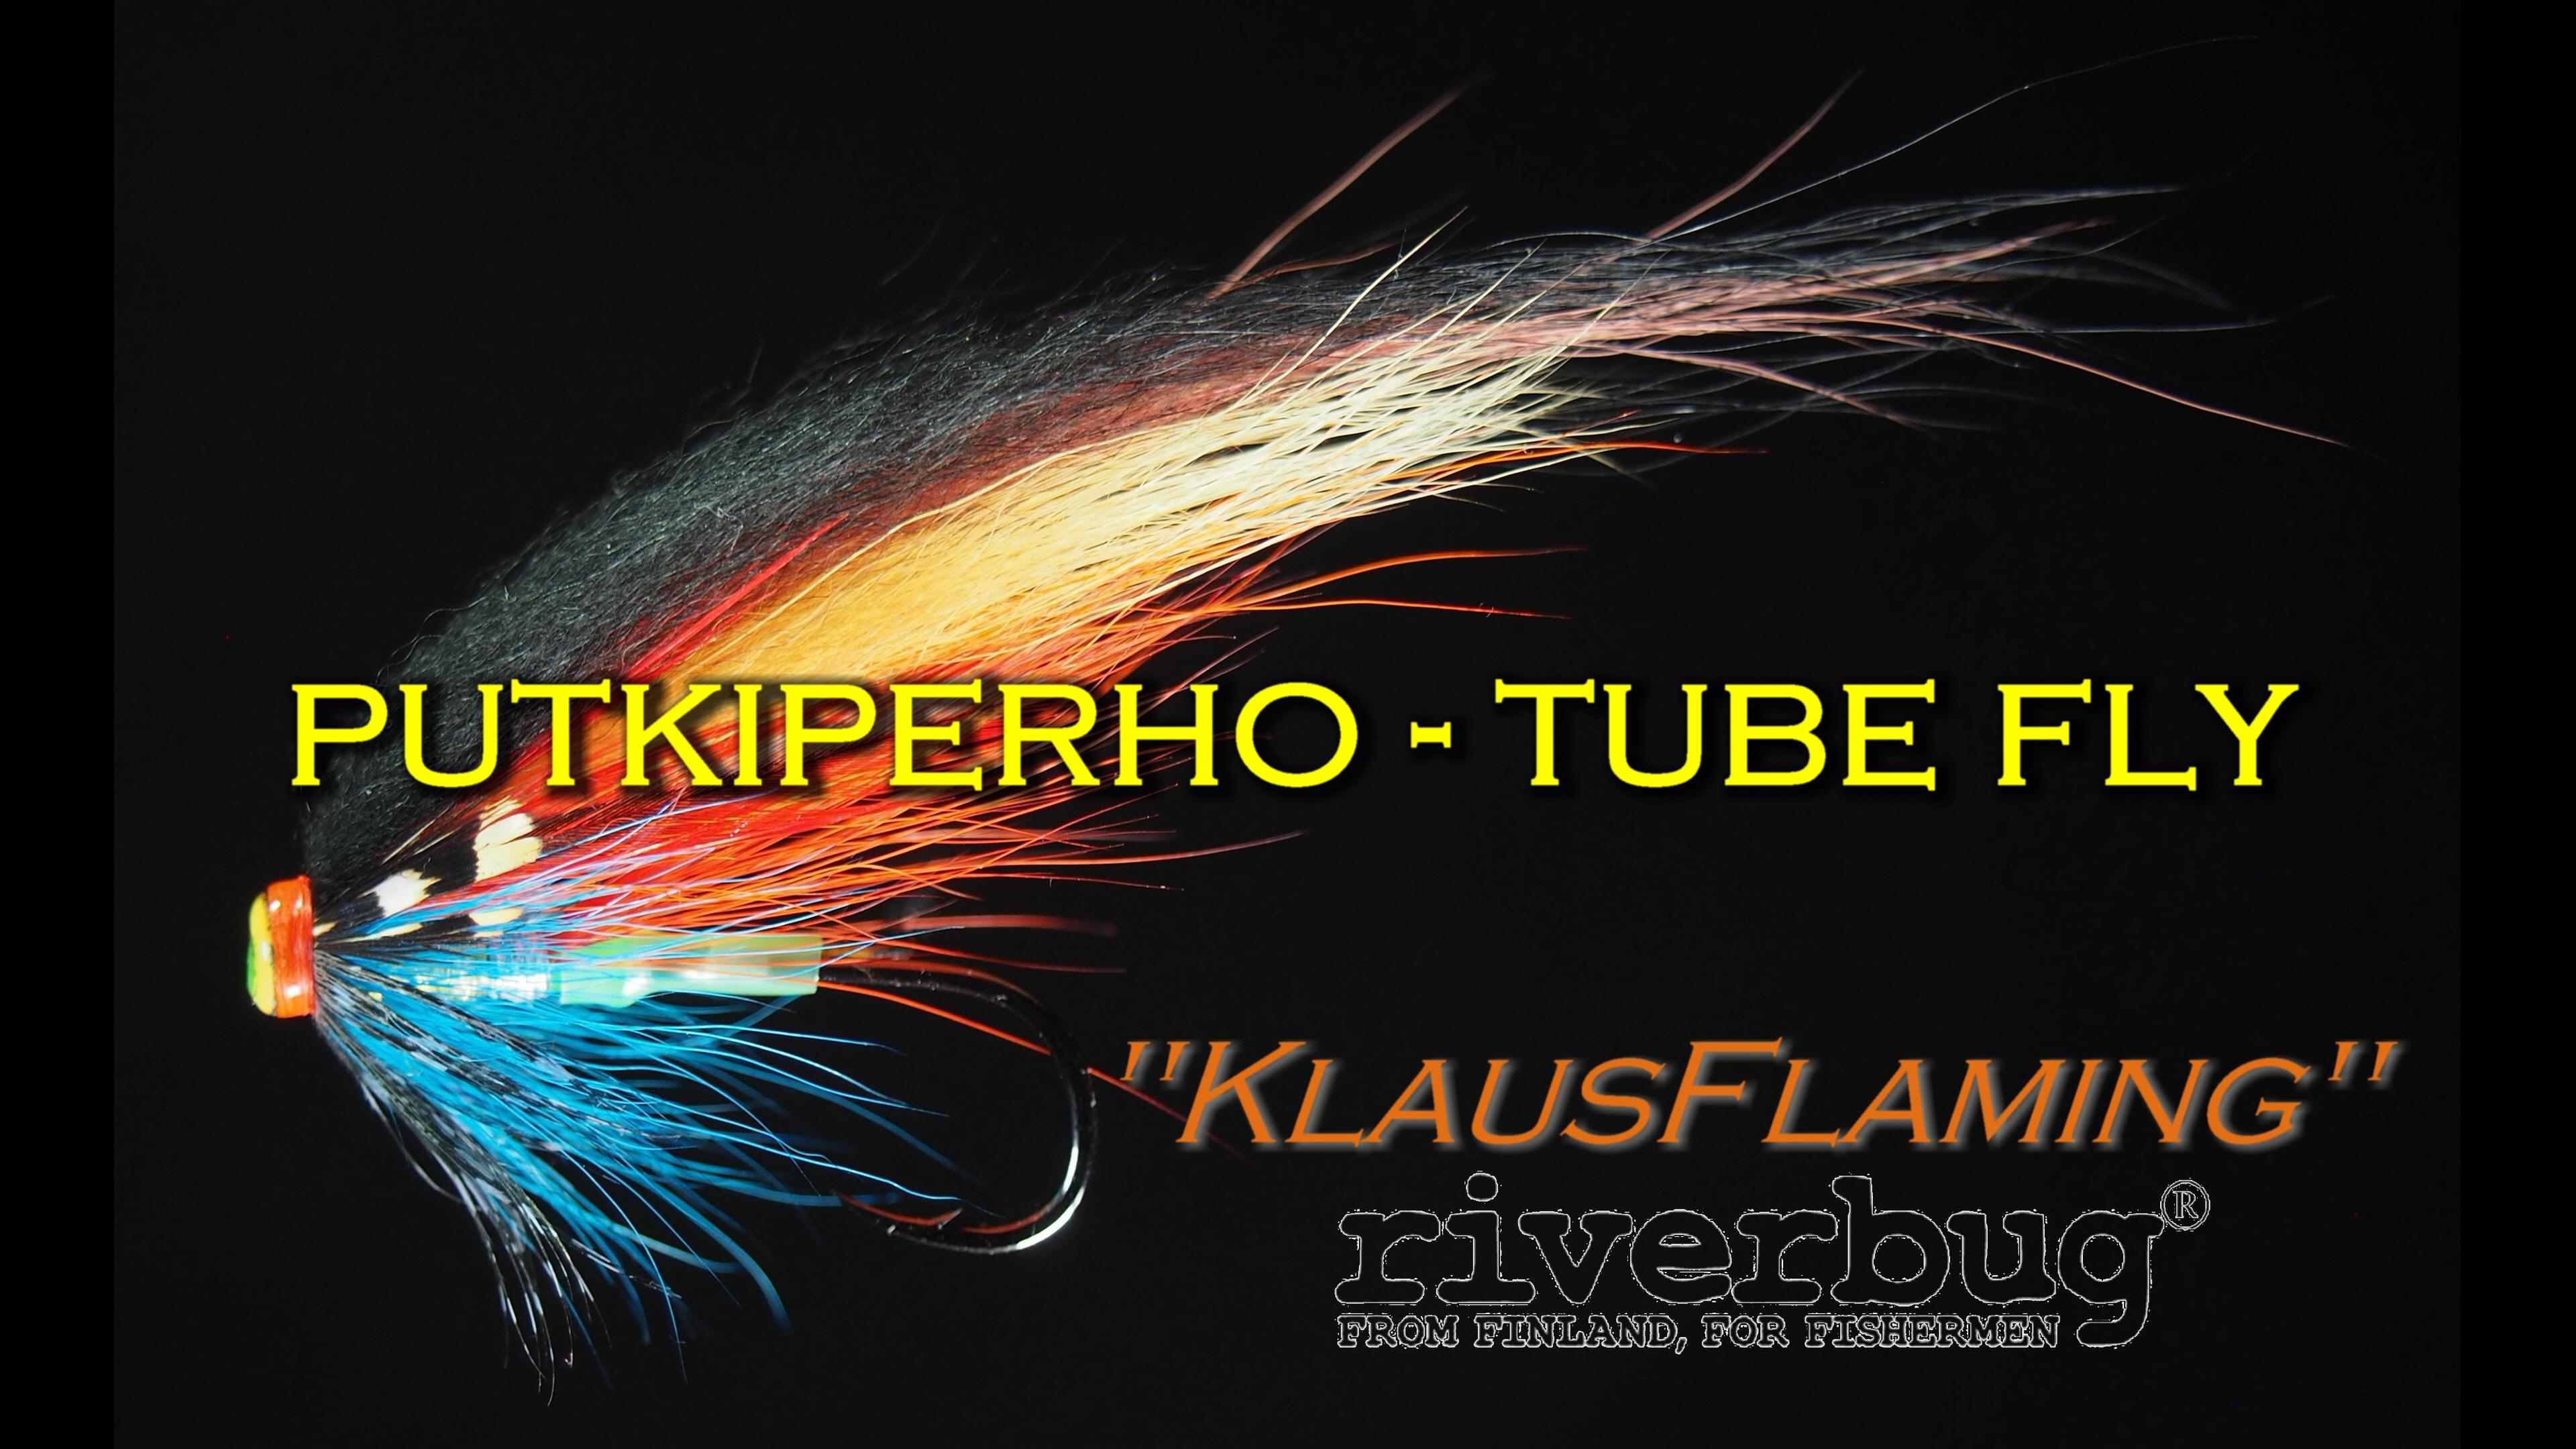 RiverTube - Tube Fly - Putkiperho